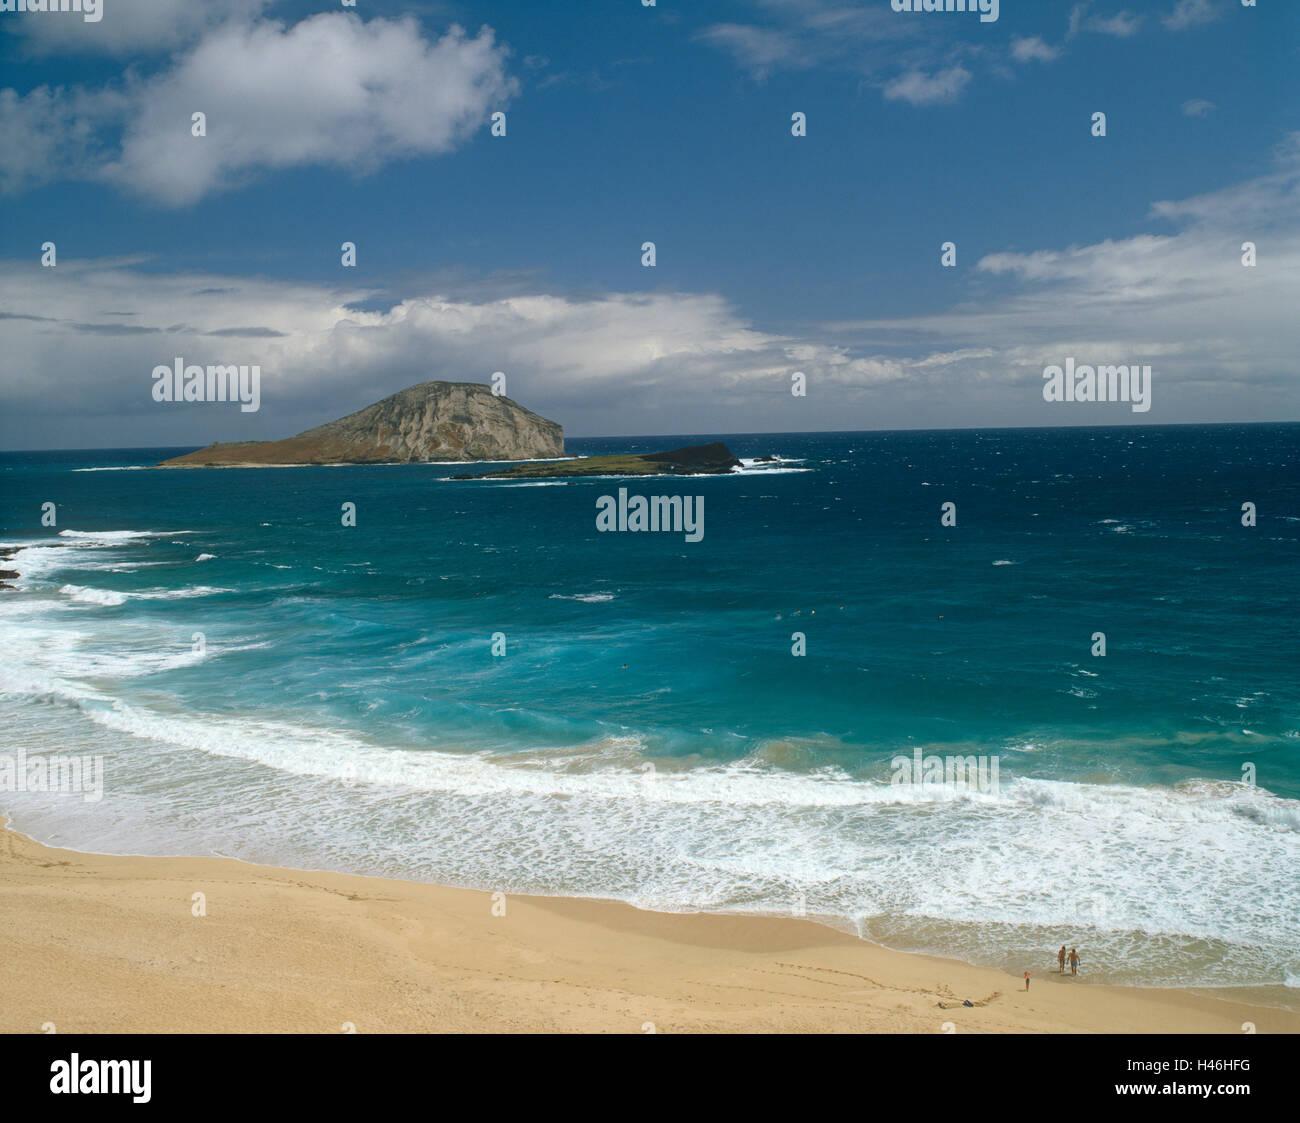 Beach scene - Stock Image